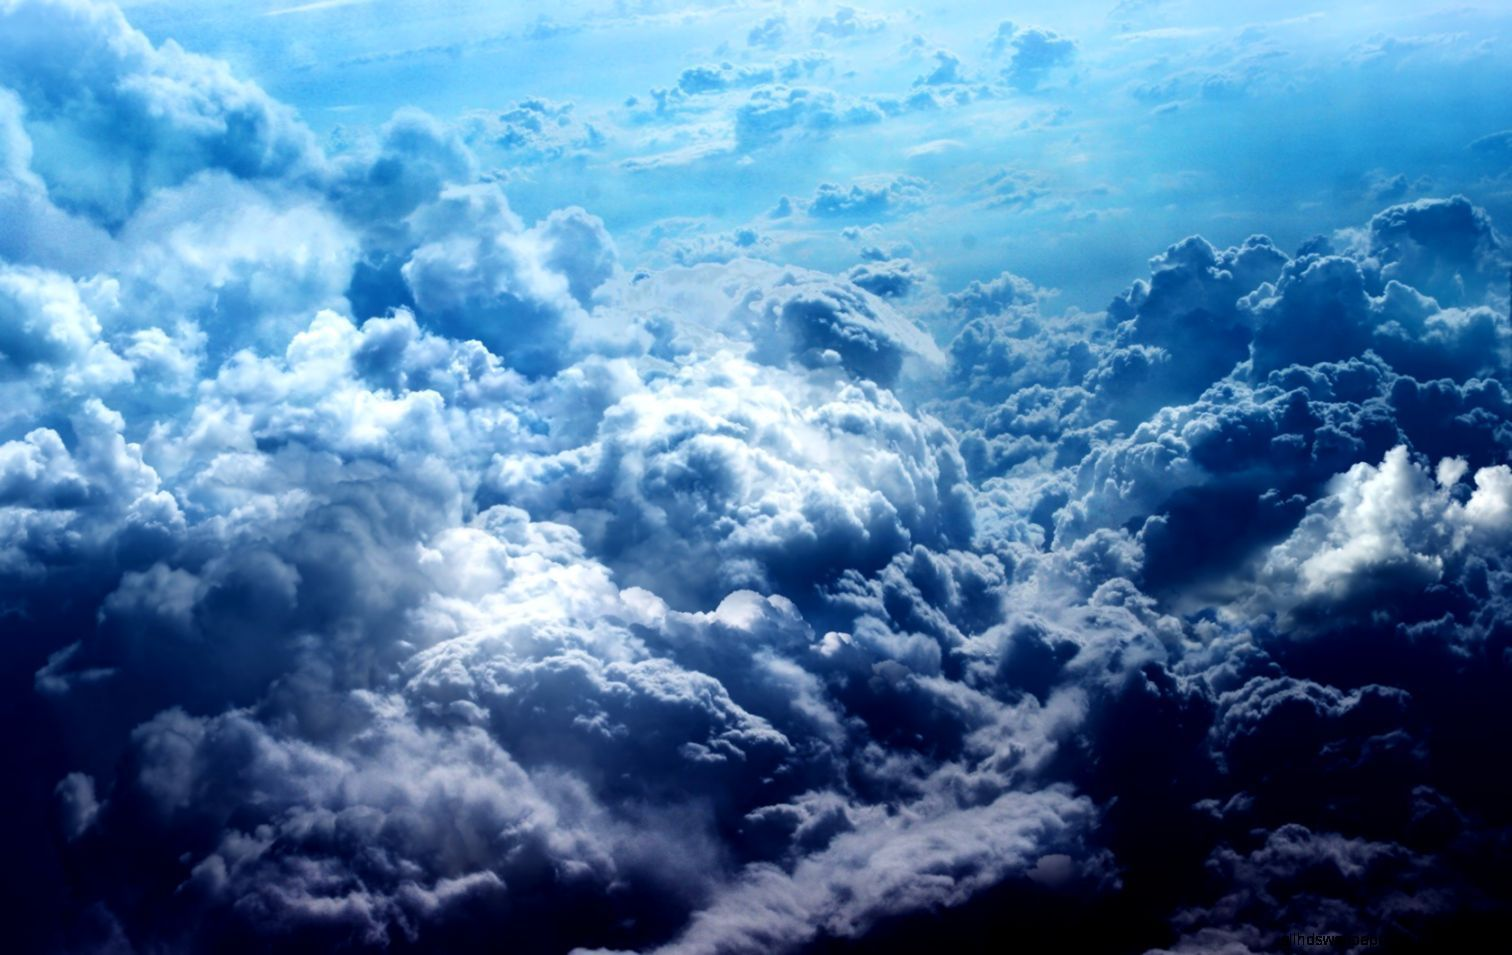 Blue Cloud Wallpapers Top Free Blue Cloud Backgrounds